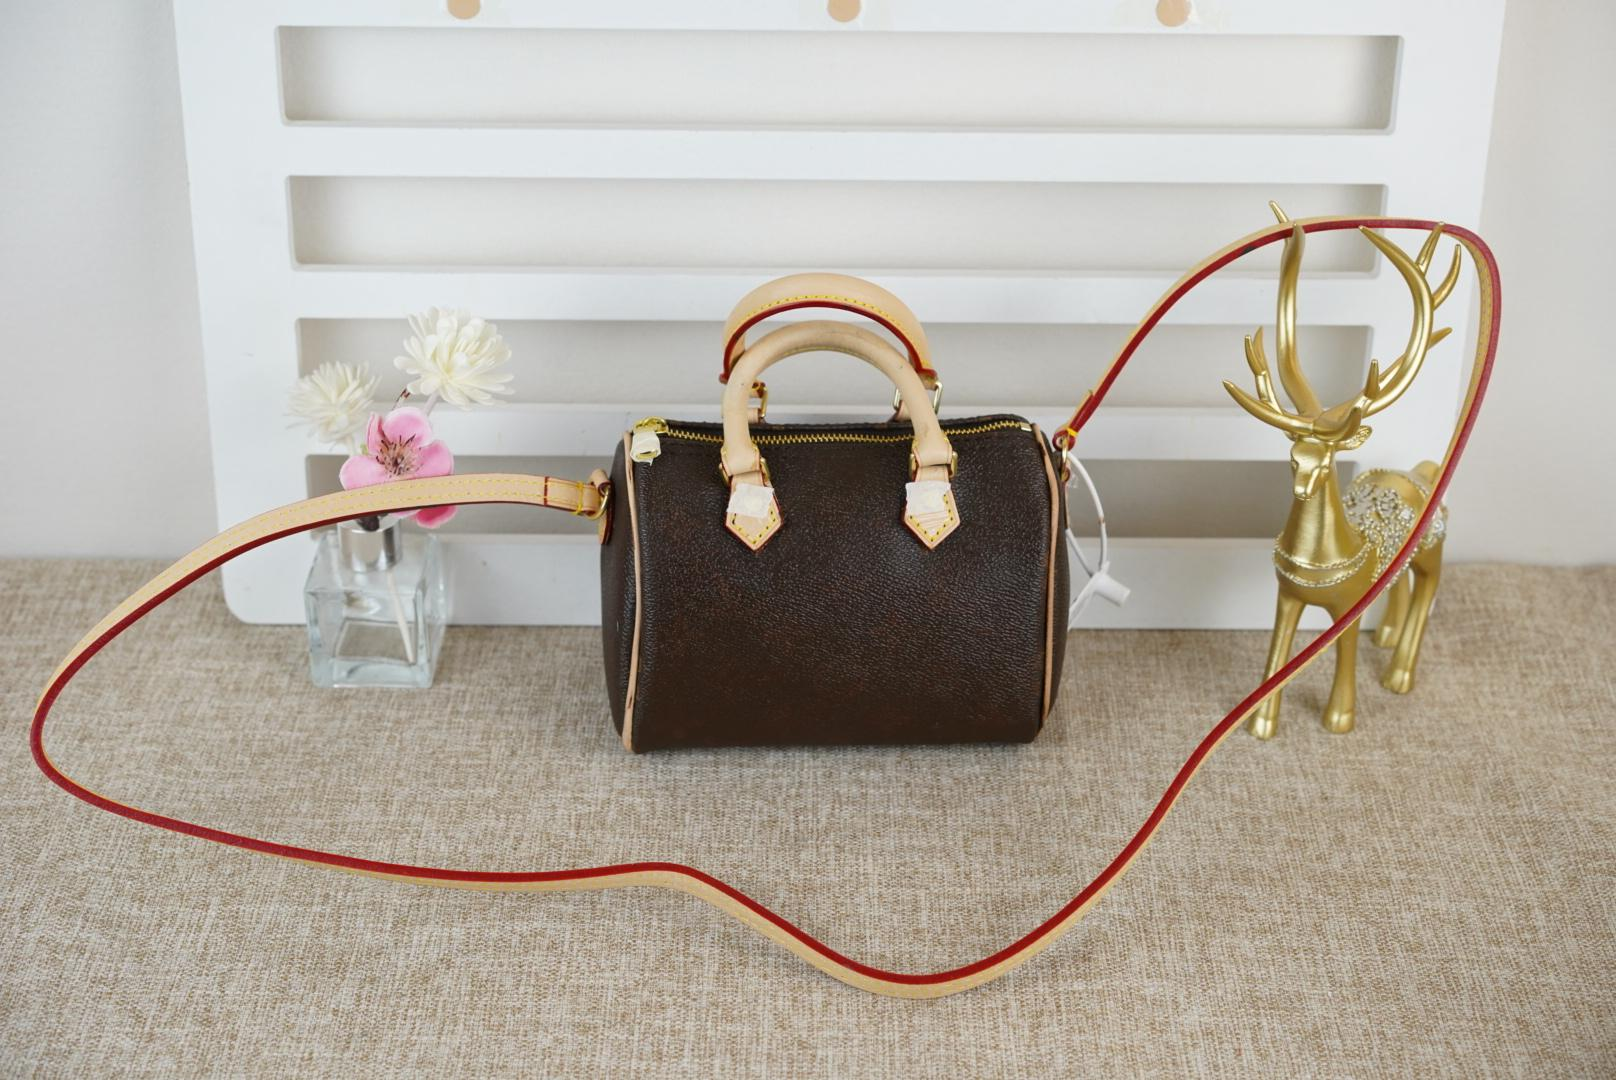 2020 Nova Mini Lona Genuíno Ladge Lady Messenger Bag Phone Bolsa de Telefone Fashion Sachel Ombro Bag Bolsa 61252 Frete Grátis!